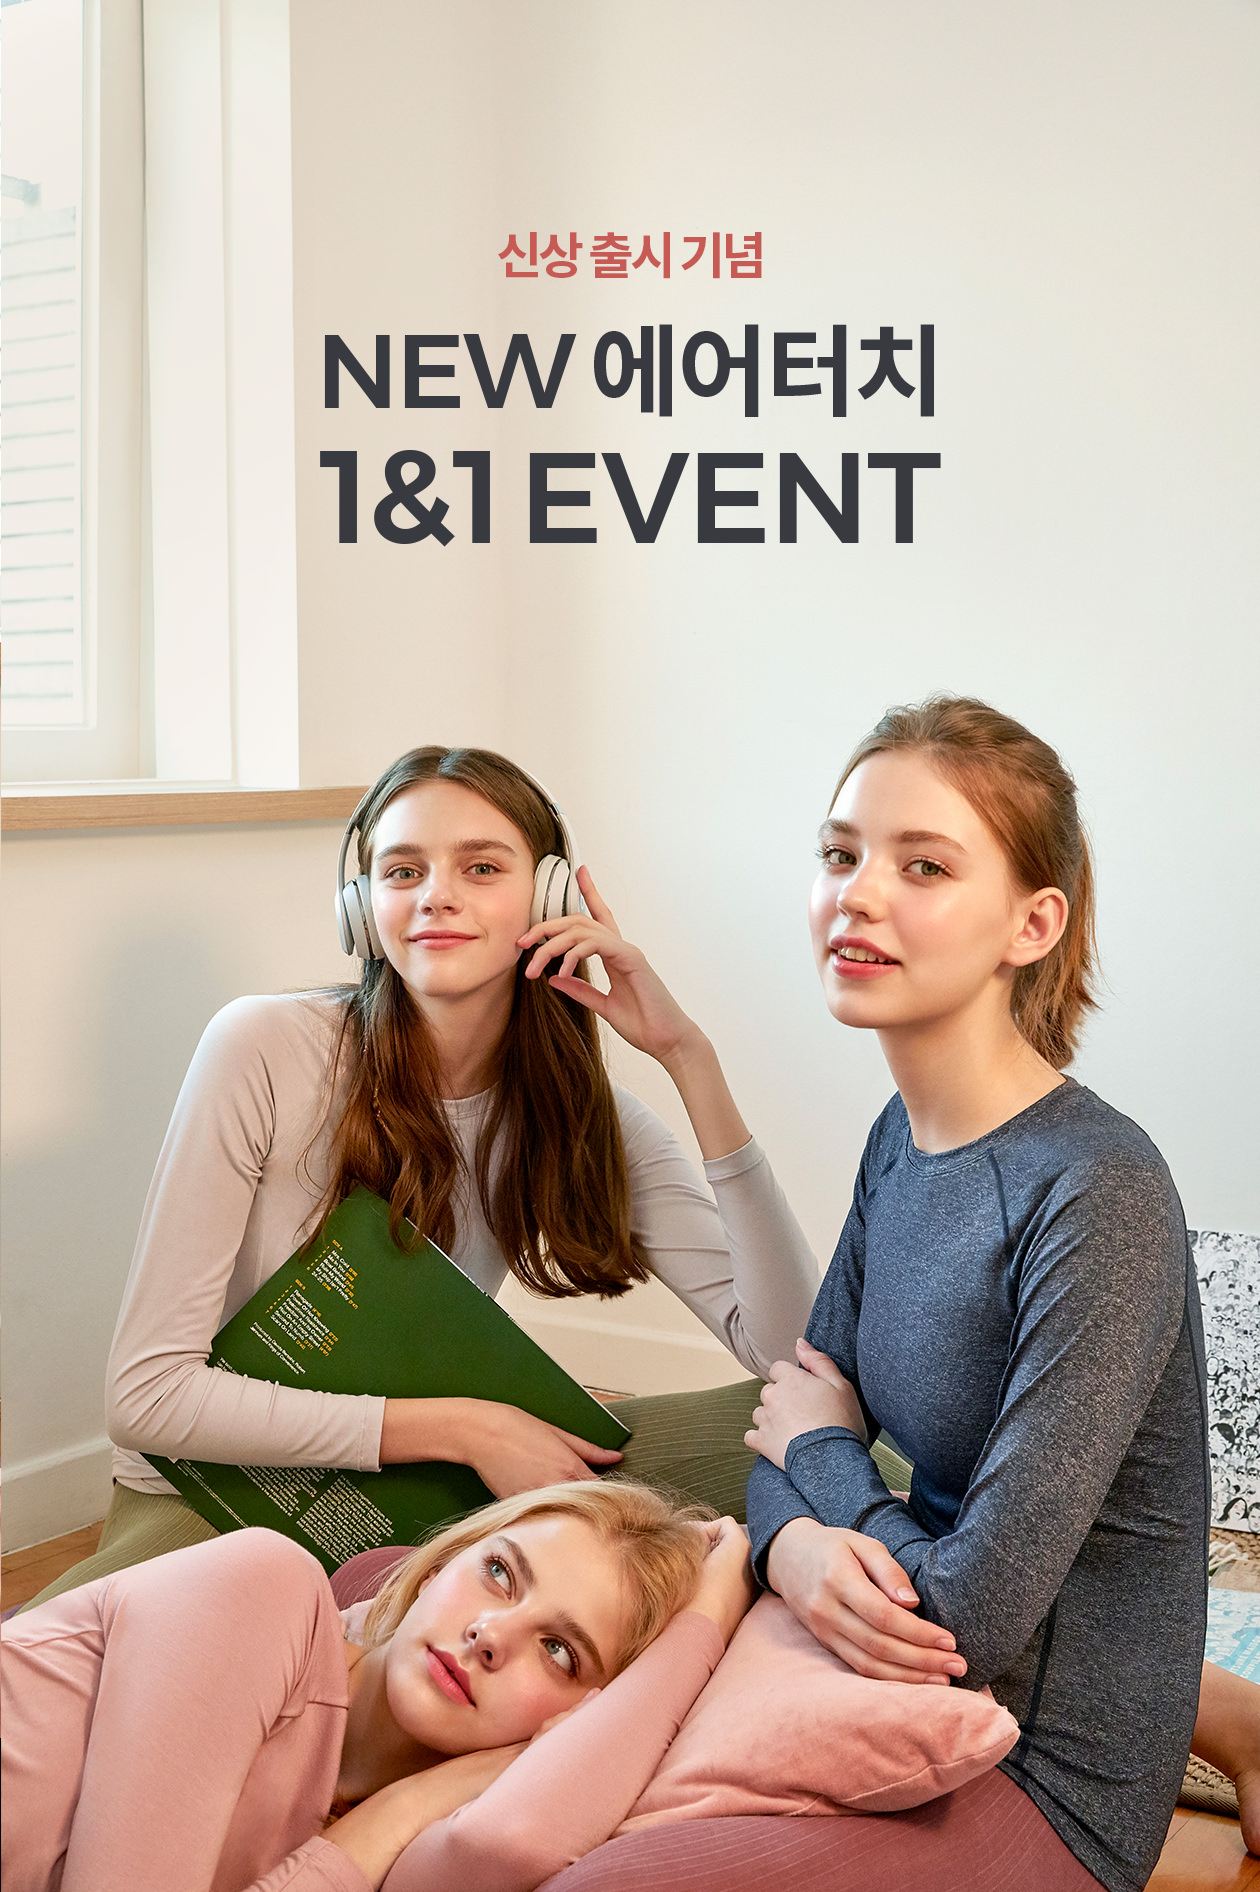 NEW 안다르 에어터치1&1 EVENT